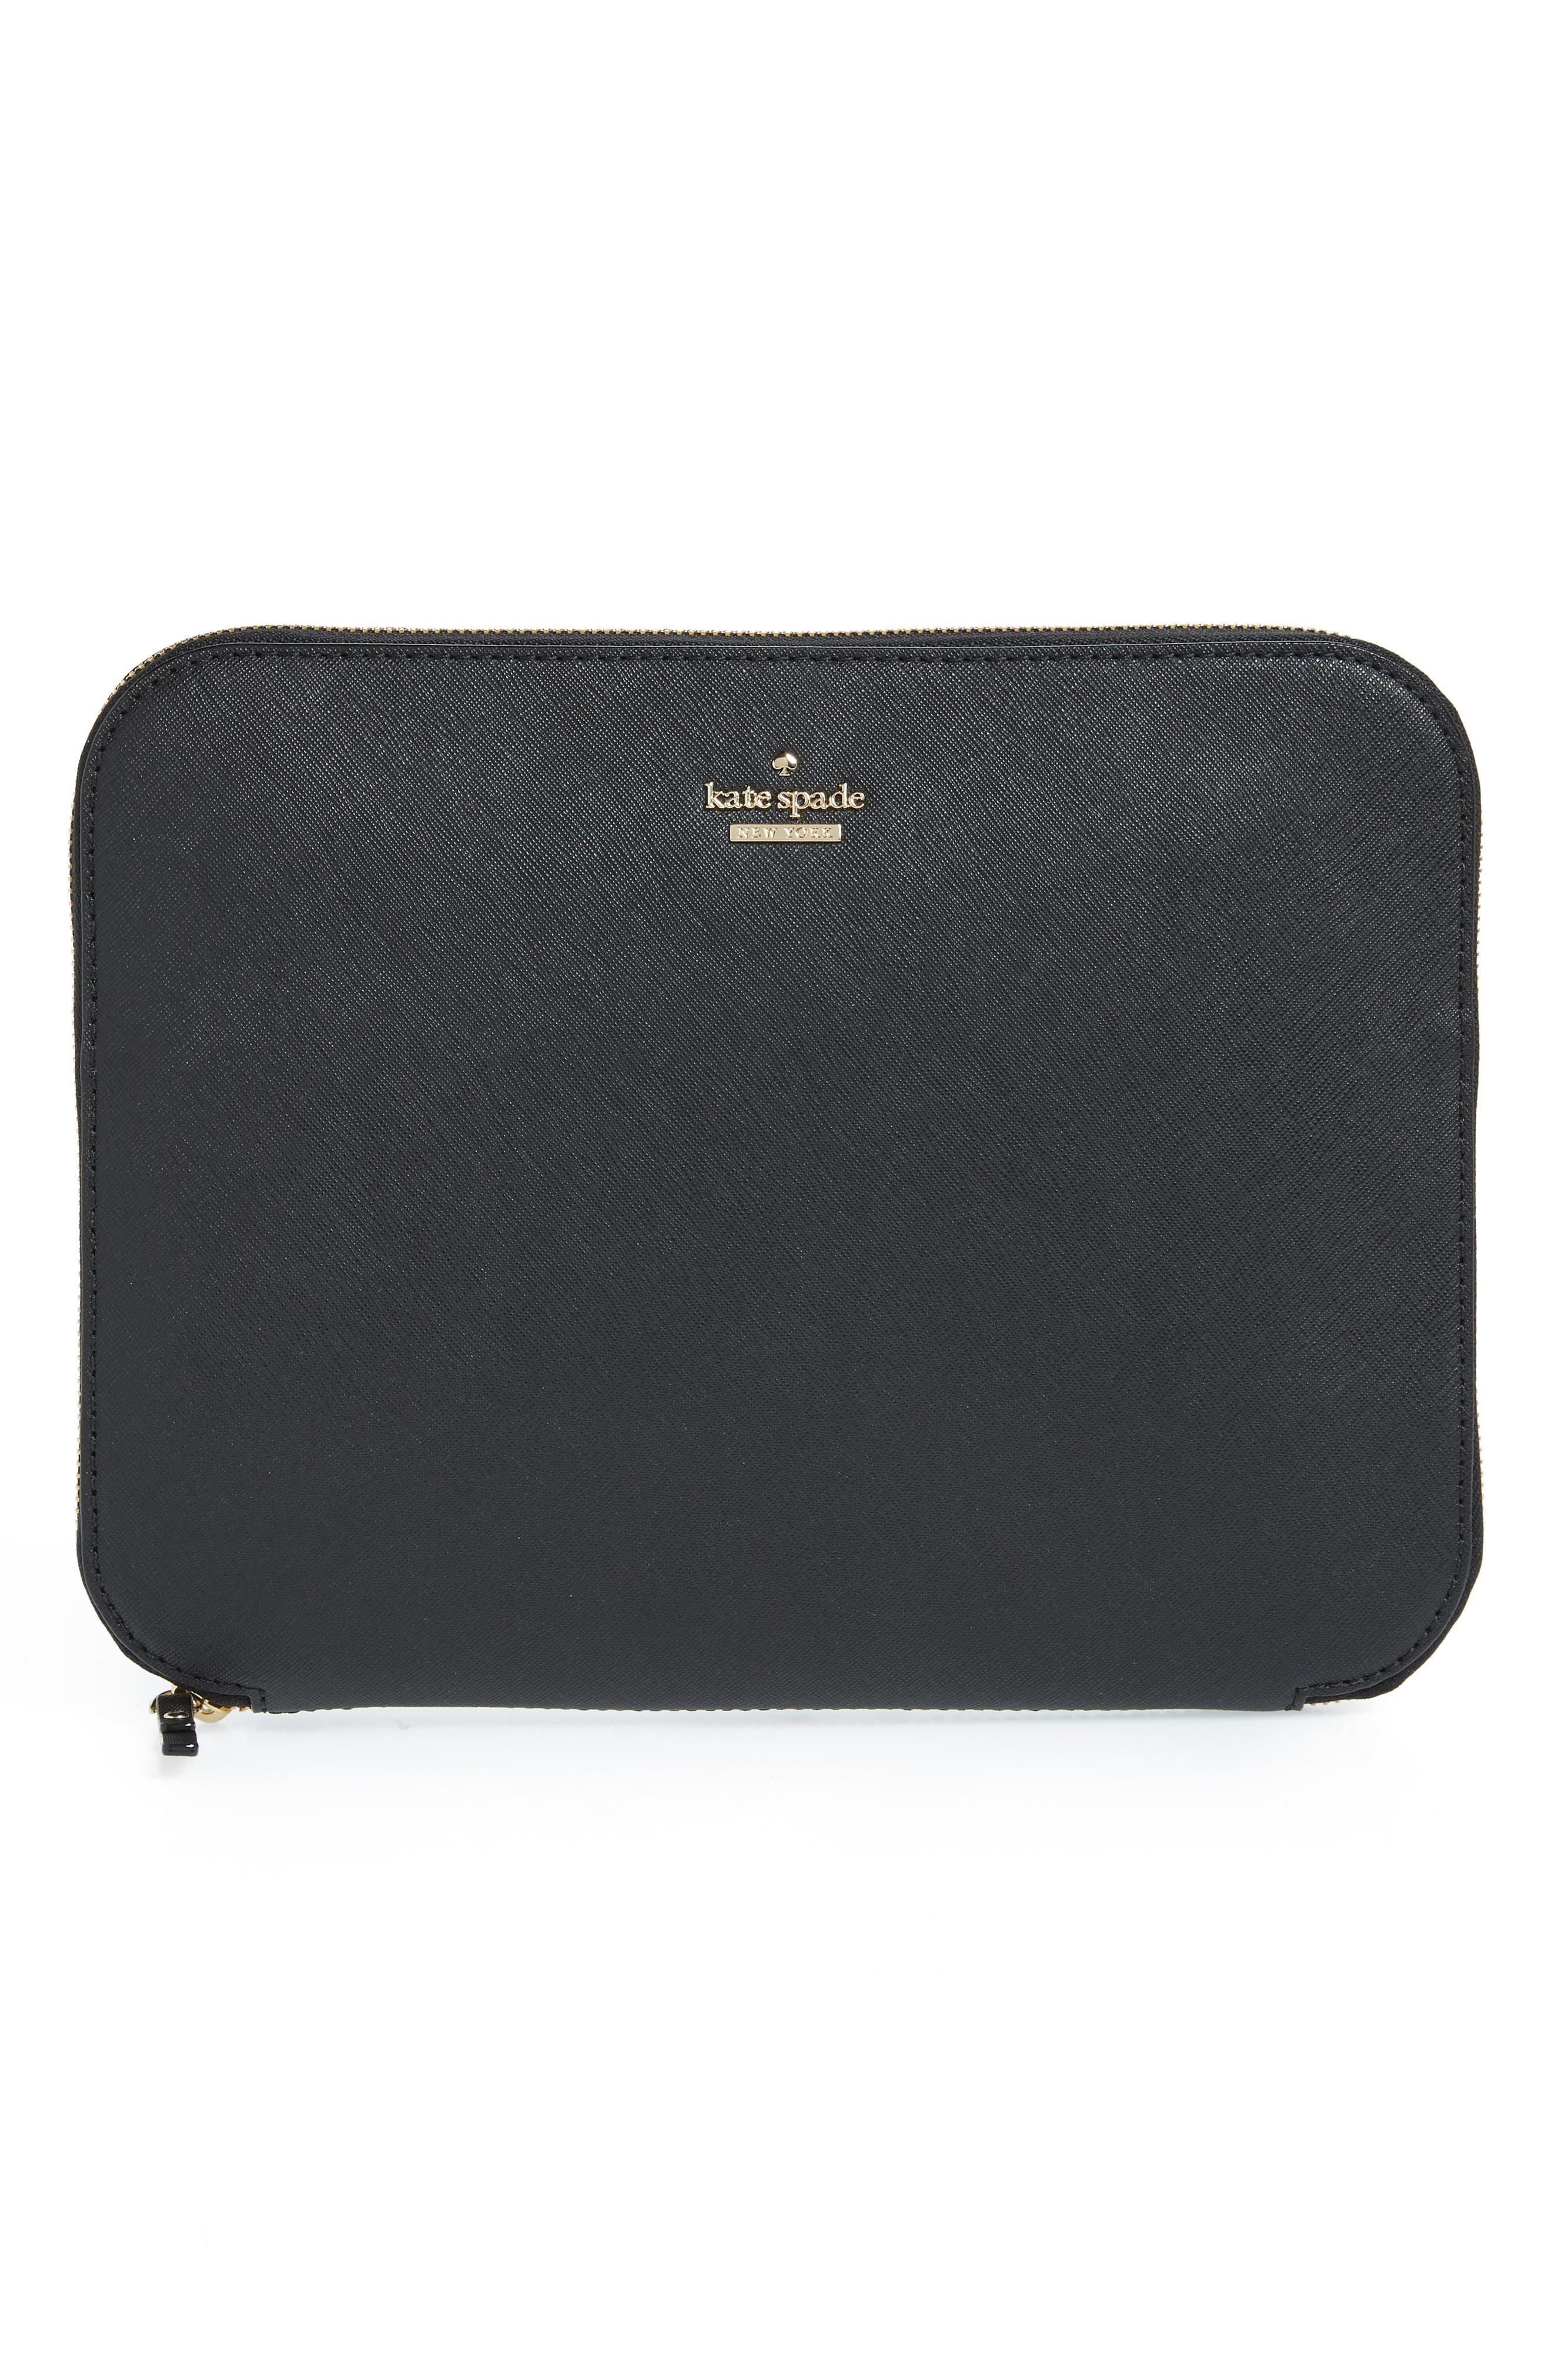 saffiano leather organization tablet sleeve,                             Main thumbnail 1, color,                             BLACK